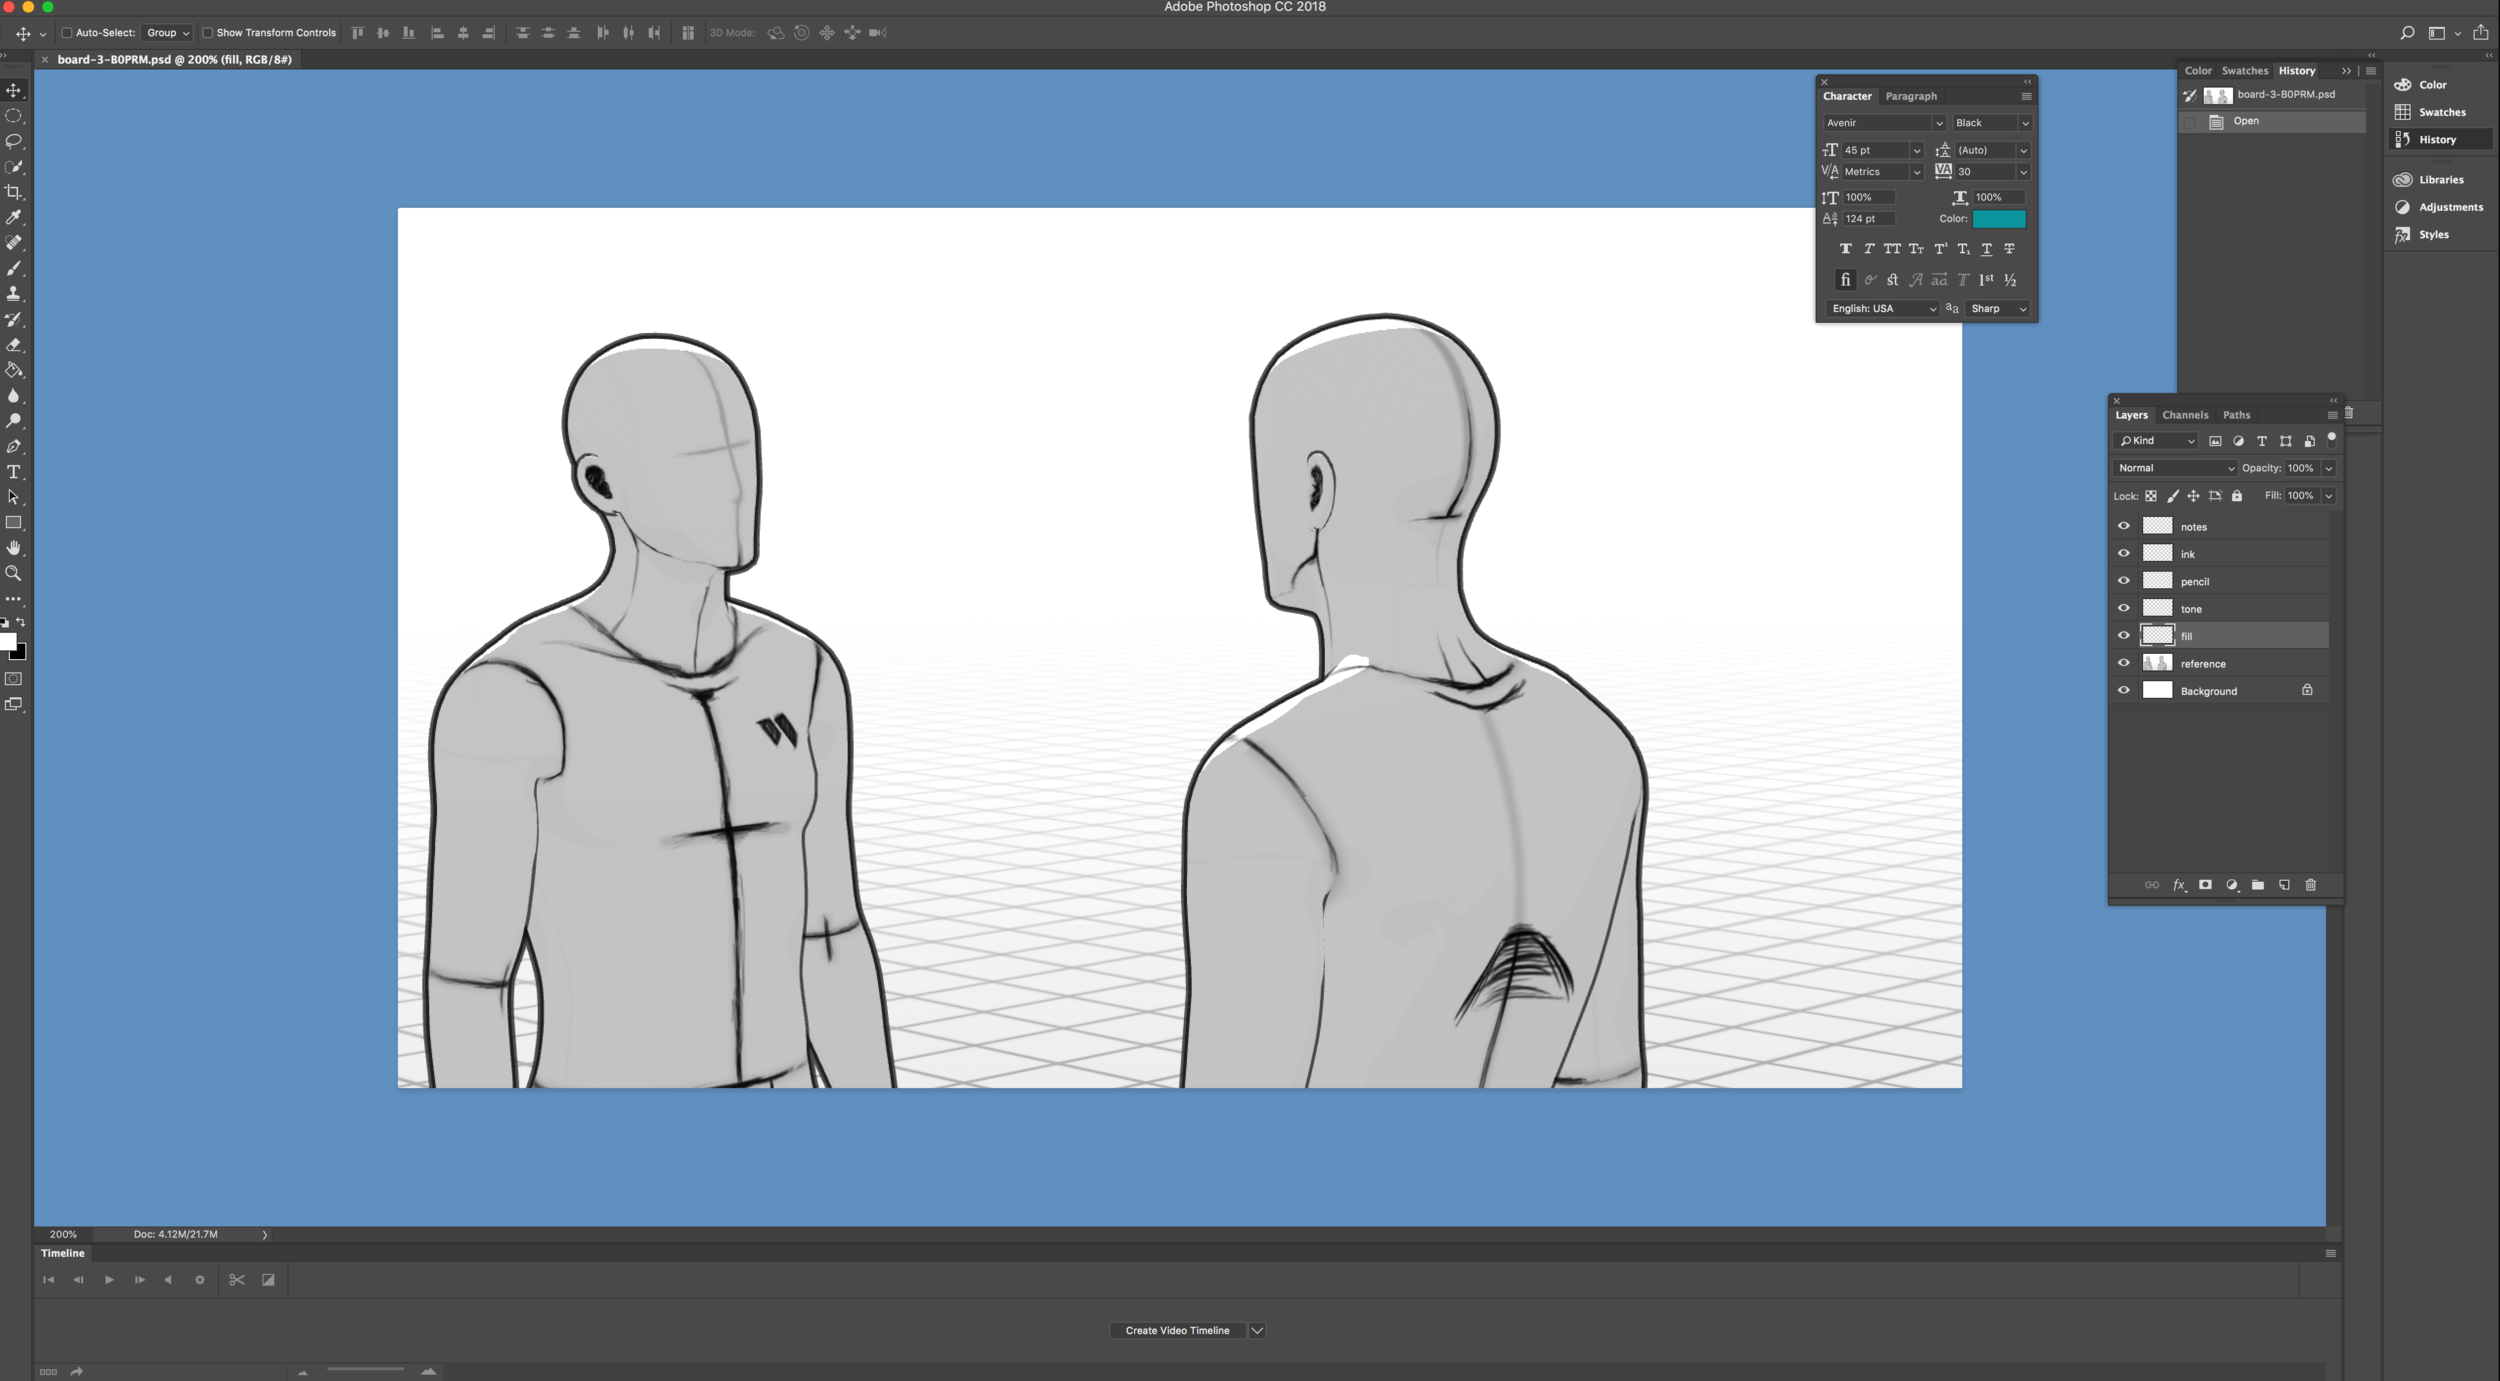 Storyboarder Adobe Photoshop Integration